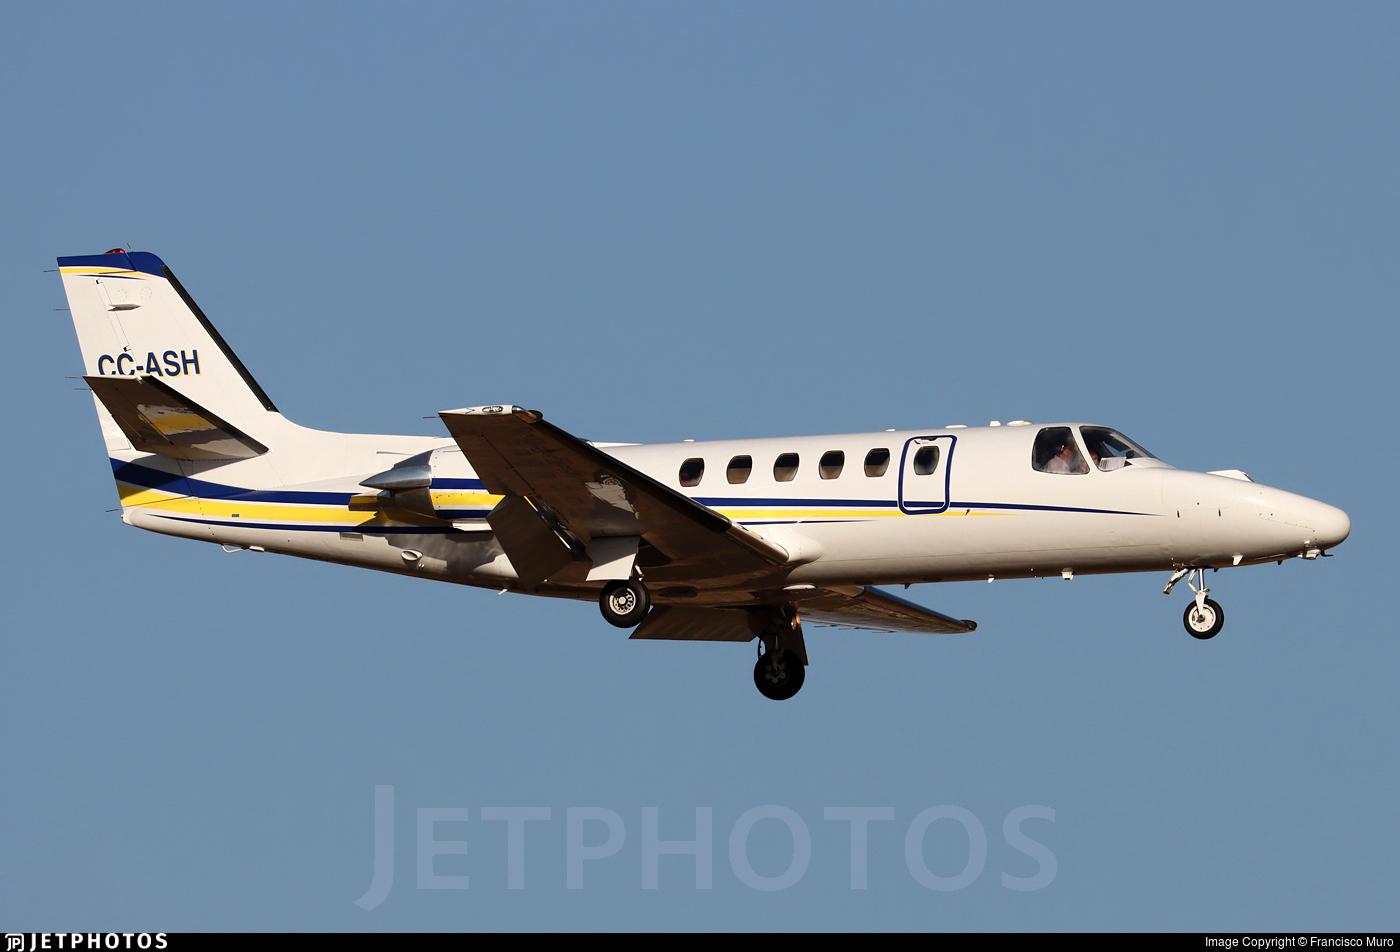 CC-ASH - Cessna 550 Citation II - Private